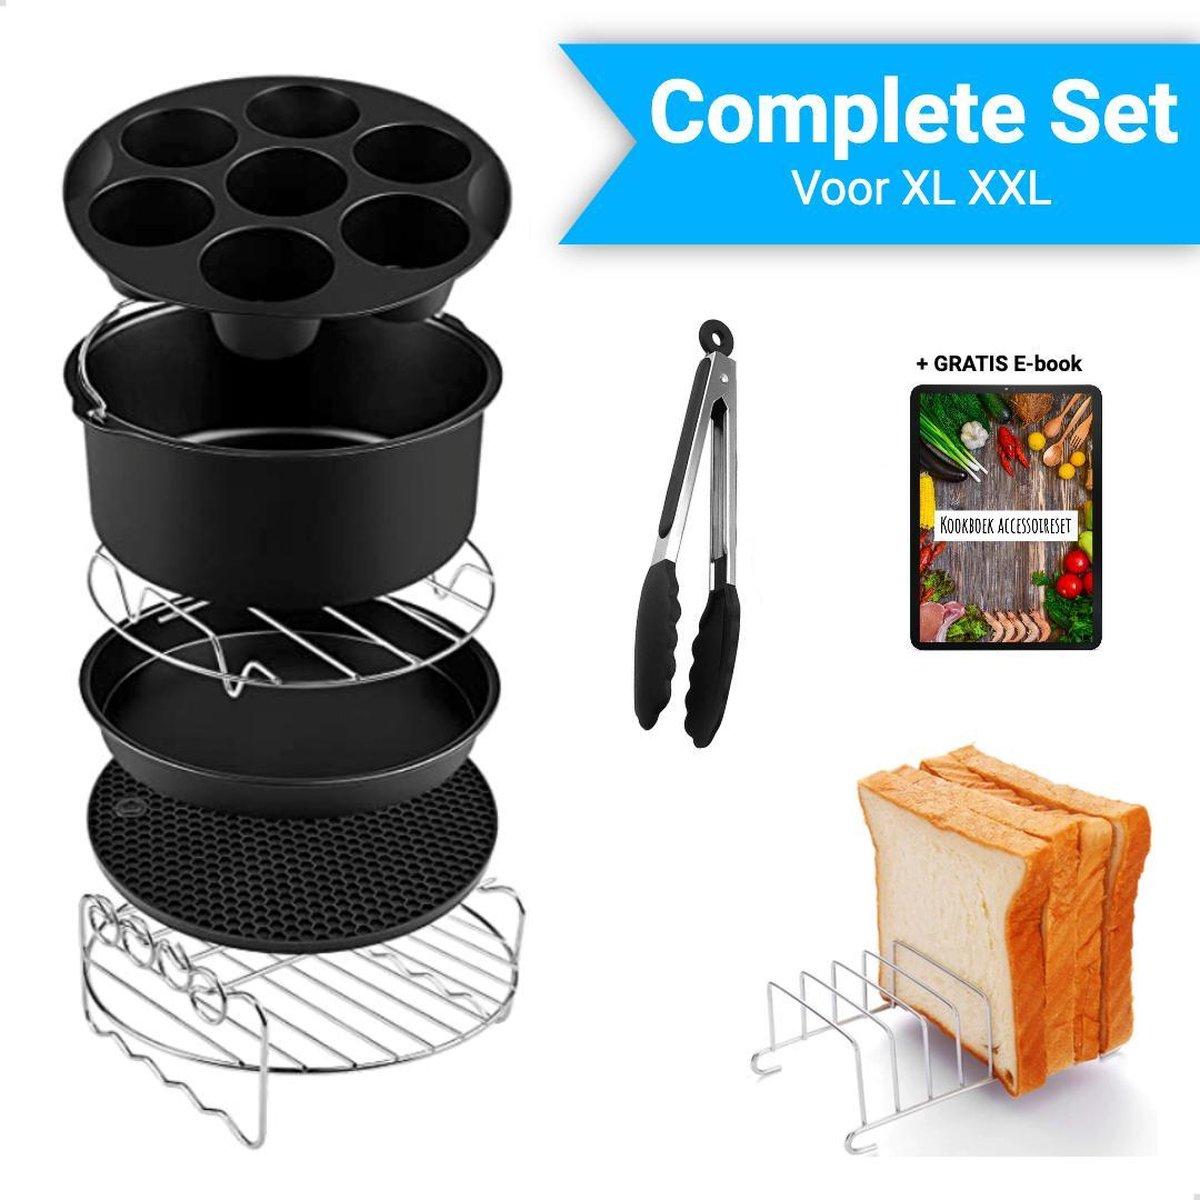 Mondio Heteluchtfriteuse Accesoires Set - XL en XXL - Bakset - Heteluchtfriteuse Accessoires - ø 20 cm